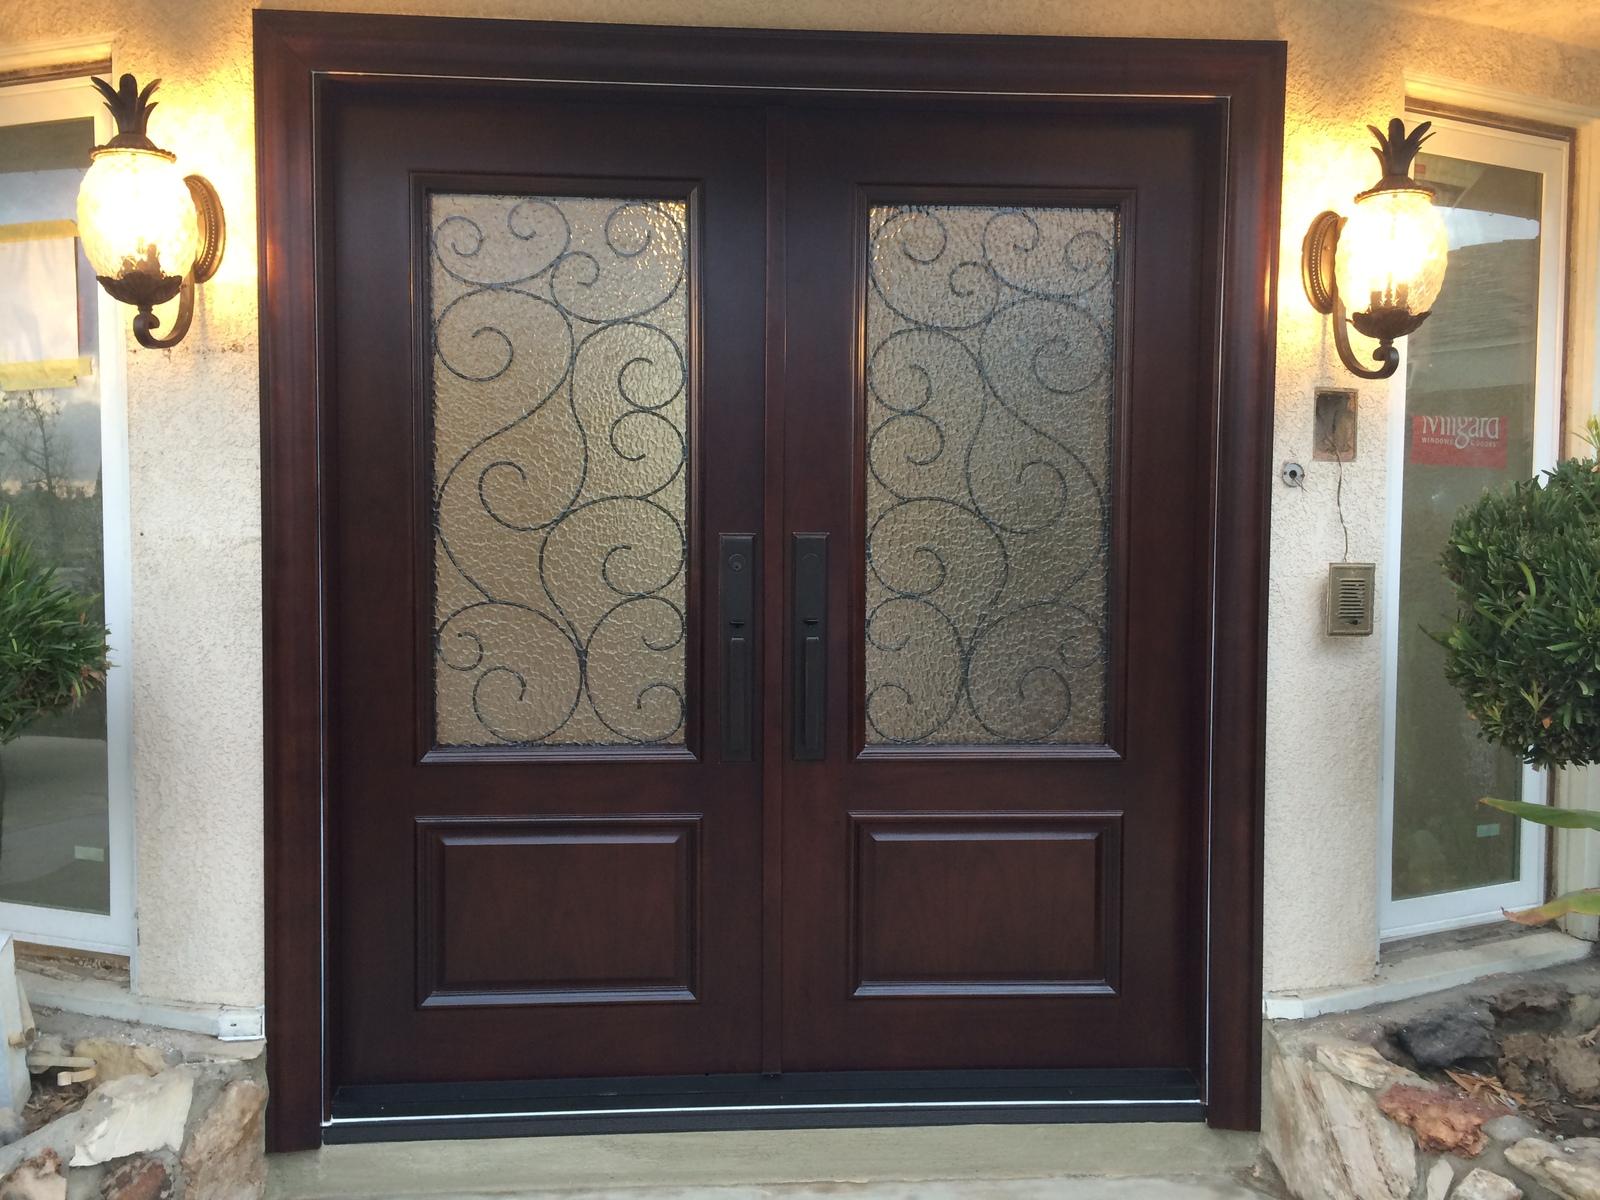 1200 #9E7A2D  Exterior Home Rustic Entry Door 5' X 6' 8 W/ 2 3/8 Thick D  picture/photo Exterior Rustic Doors 40391600